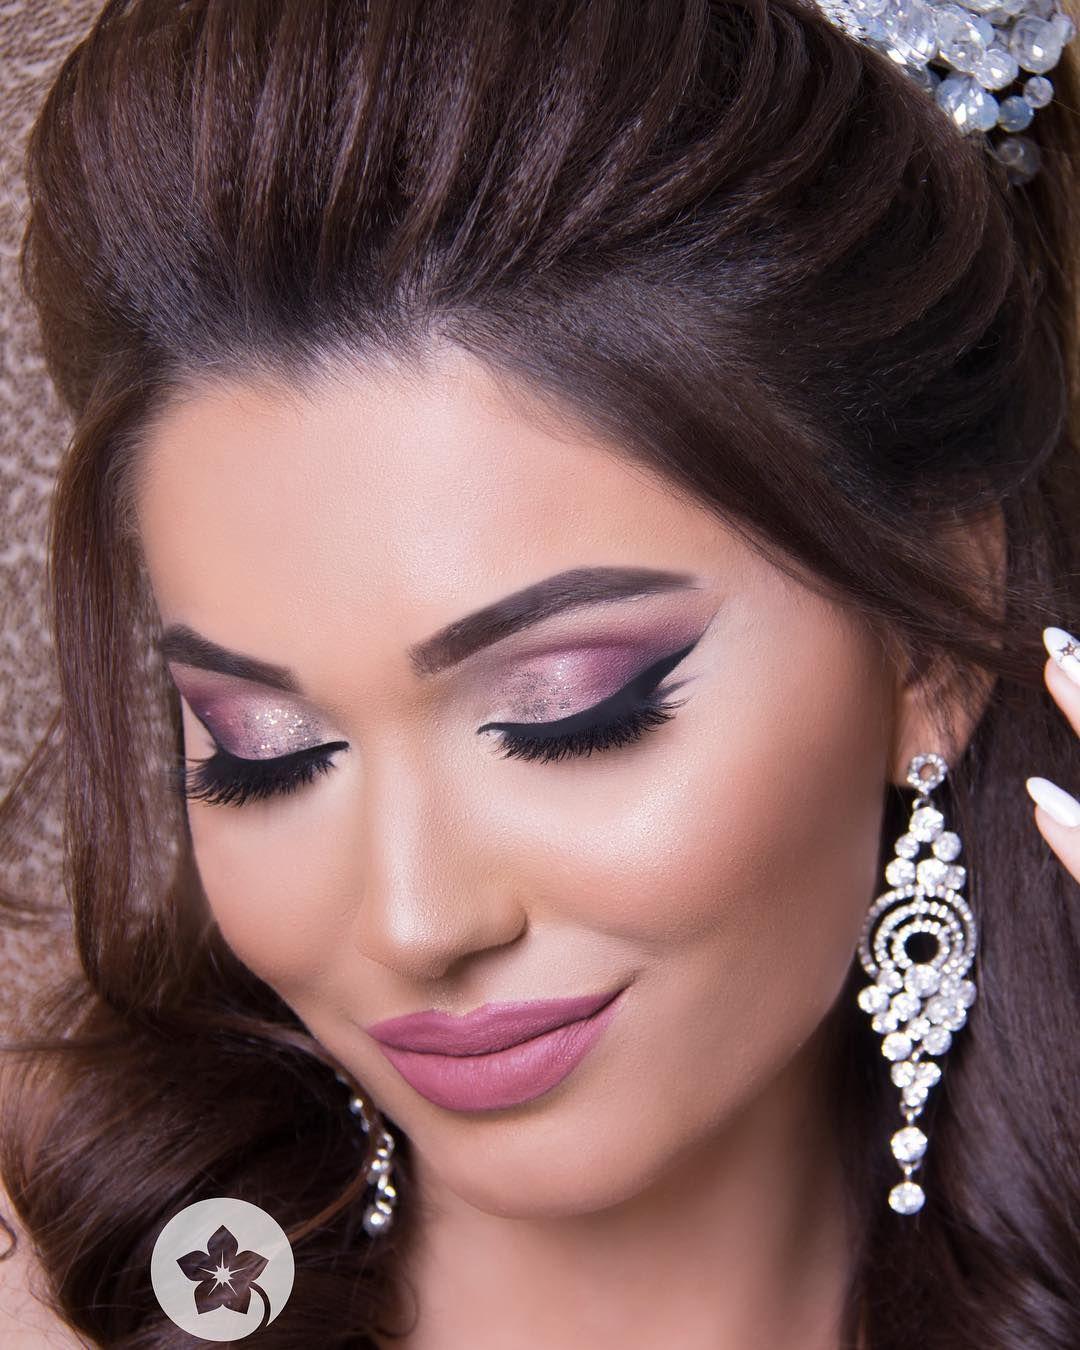 Sac Makiyaj By Me Orxideya Gozellikmerkezi Feride Orxideya Wedding Makeup Makeup Make Up